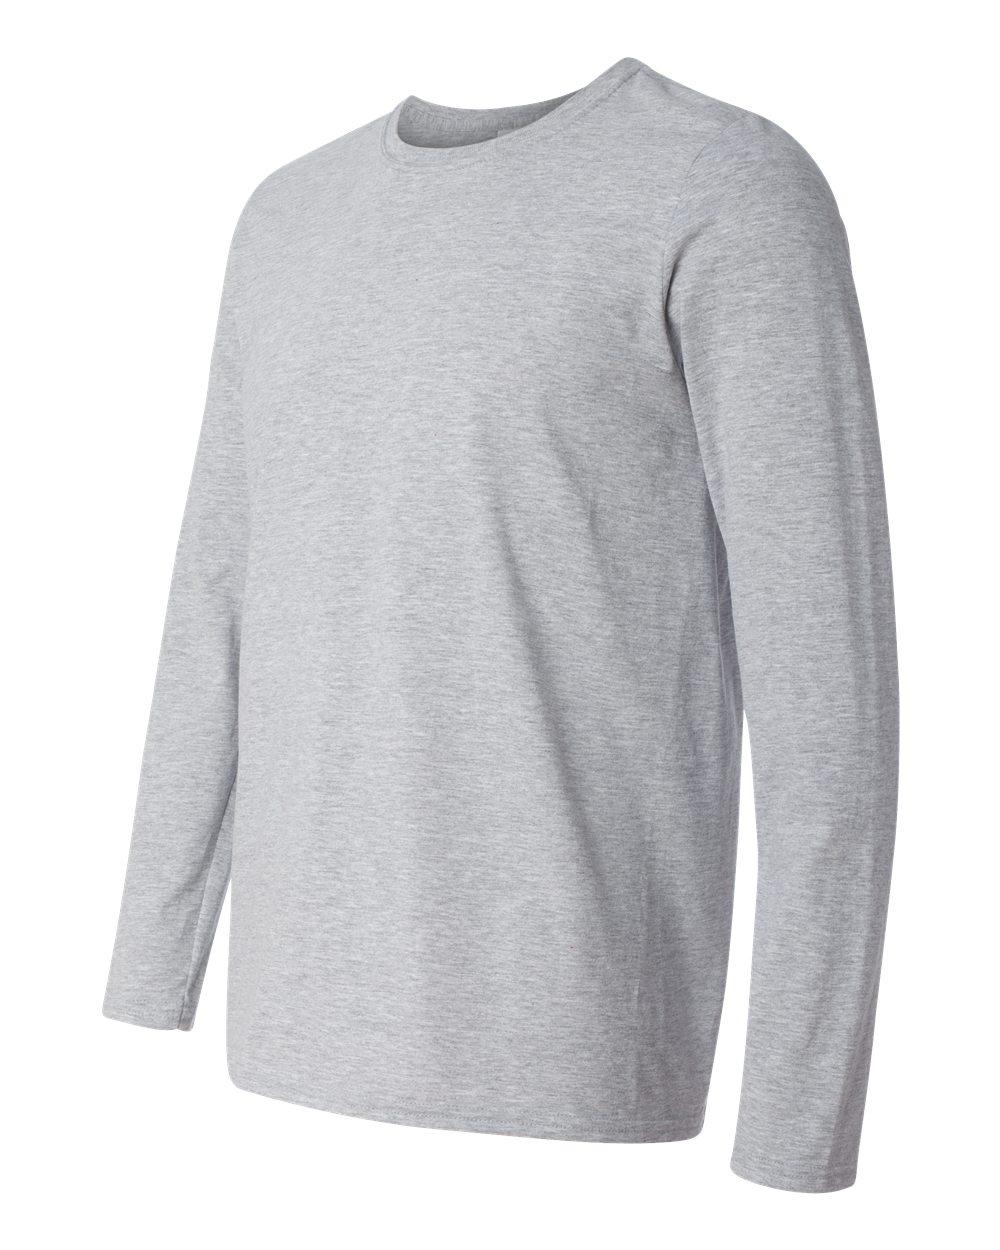 841e61d0338 Gildan 64400 - Softstyle Long Sleeve T-Shirt - Friendly Arctic Printing